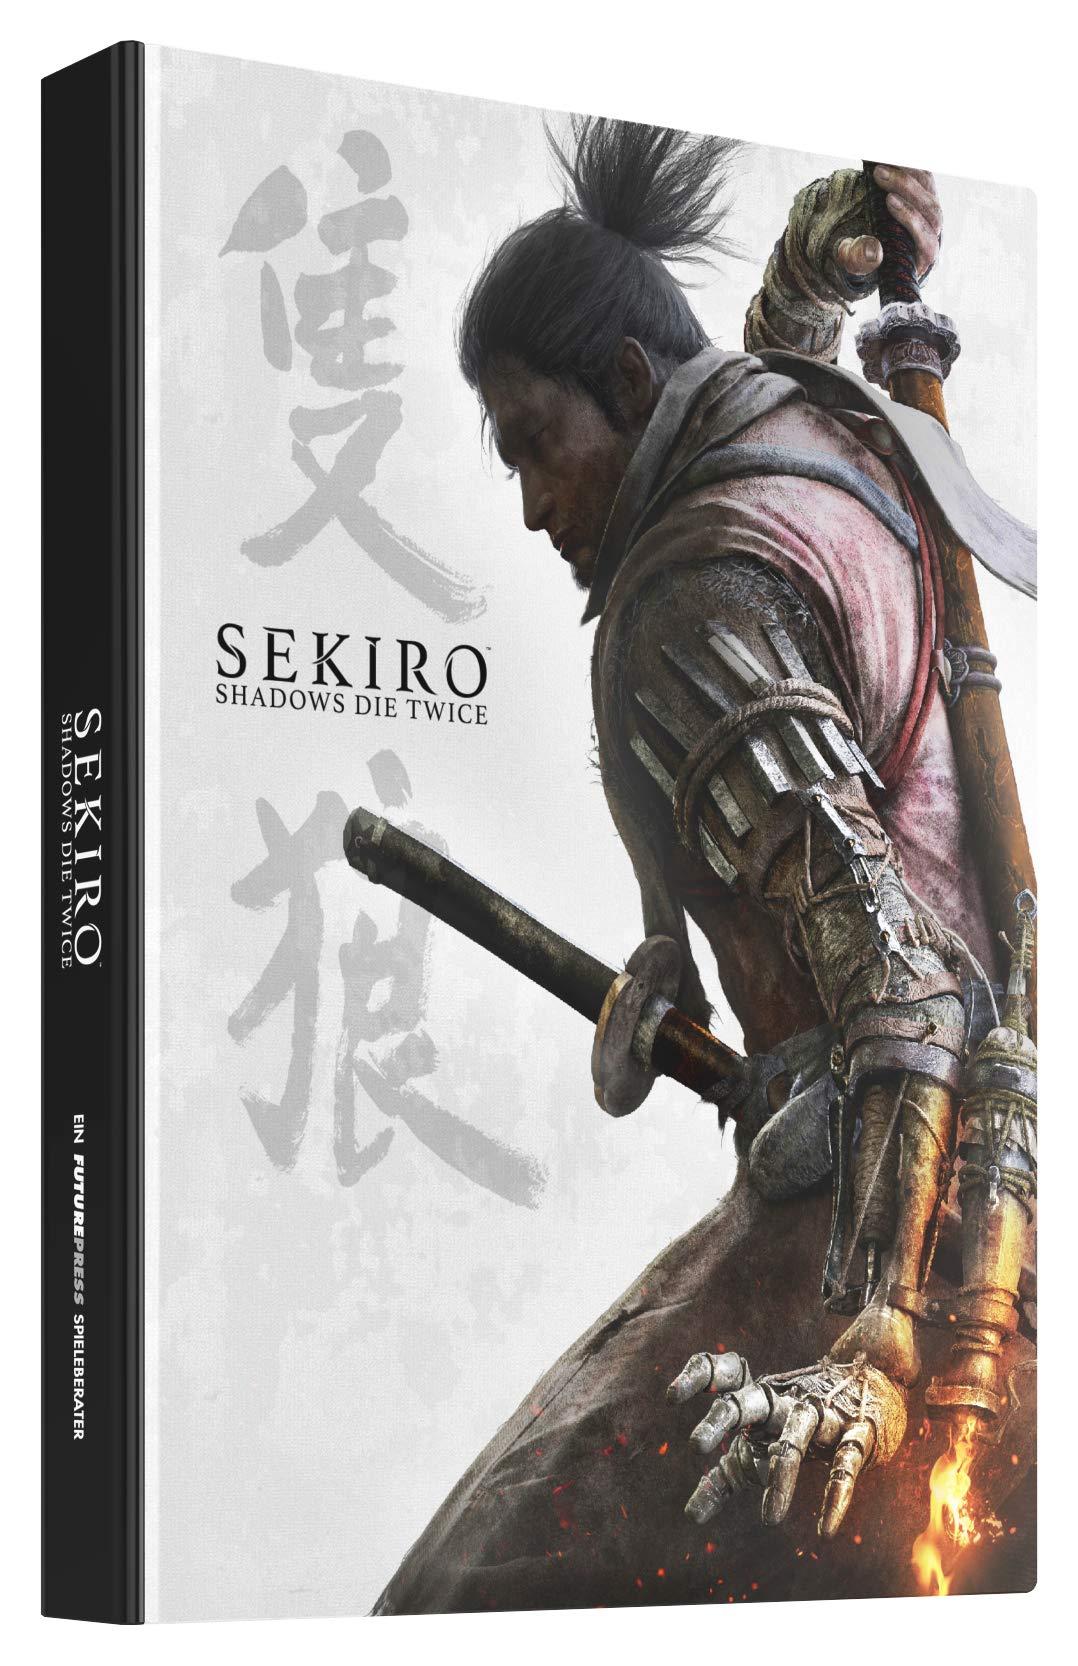 SEKIRO: SHADOWS DIE TWICE - Das offizielle Lösungsbuch: Amazon.es ...